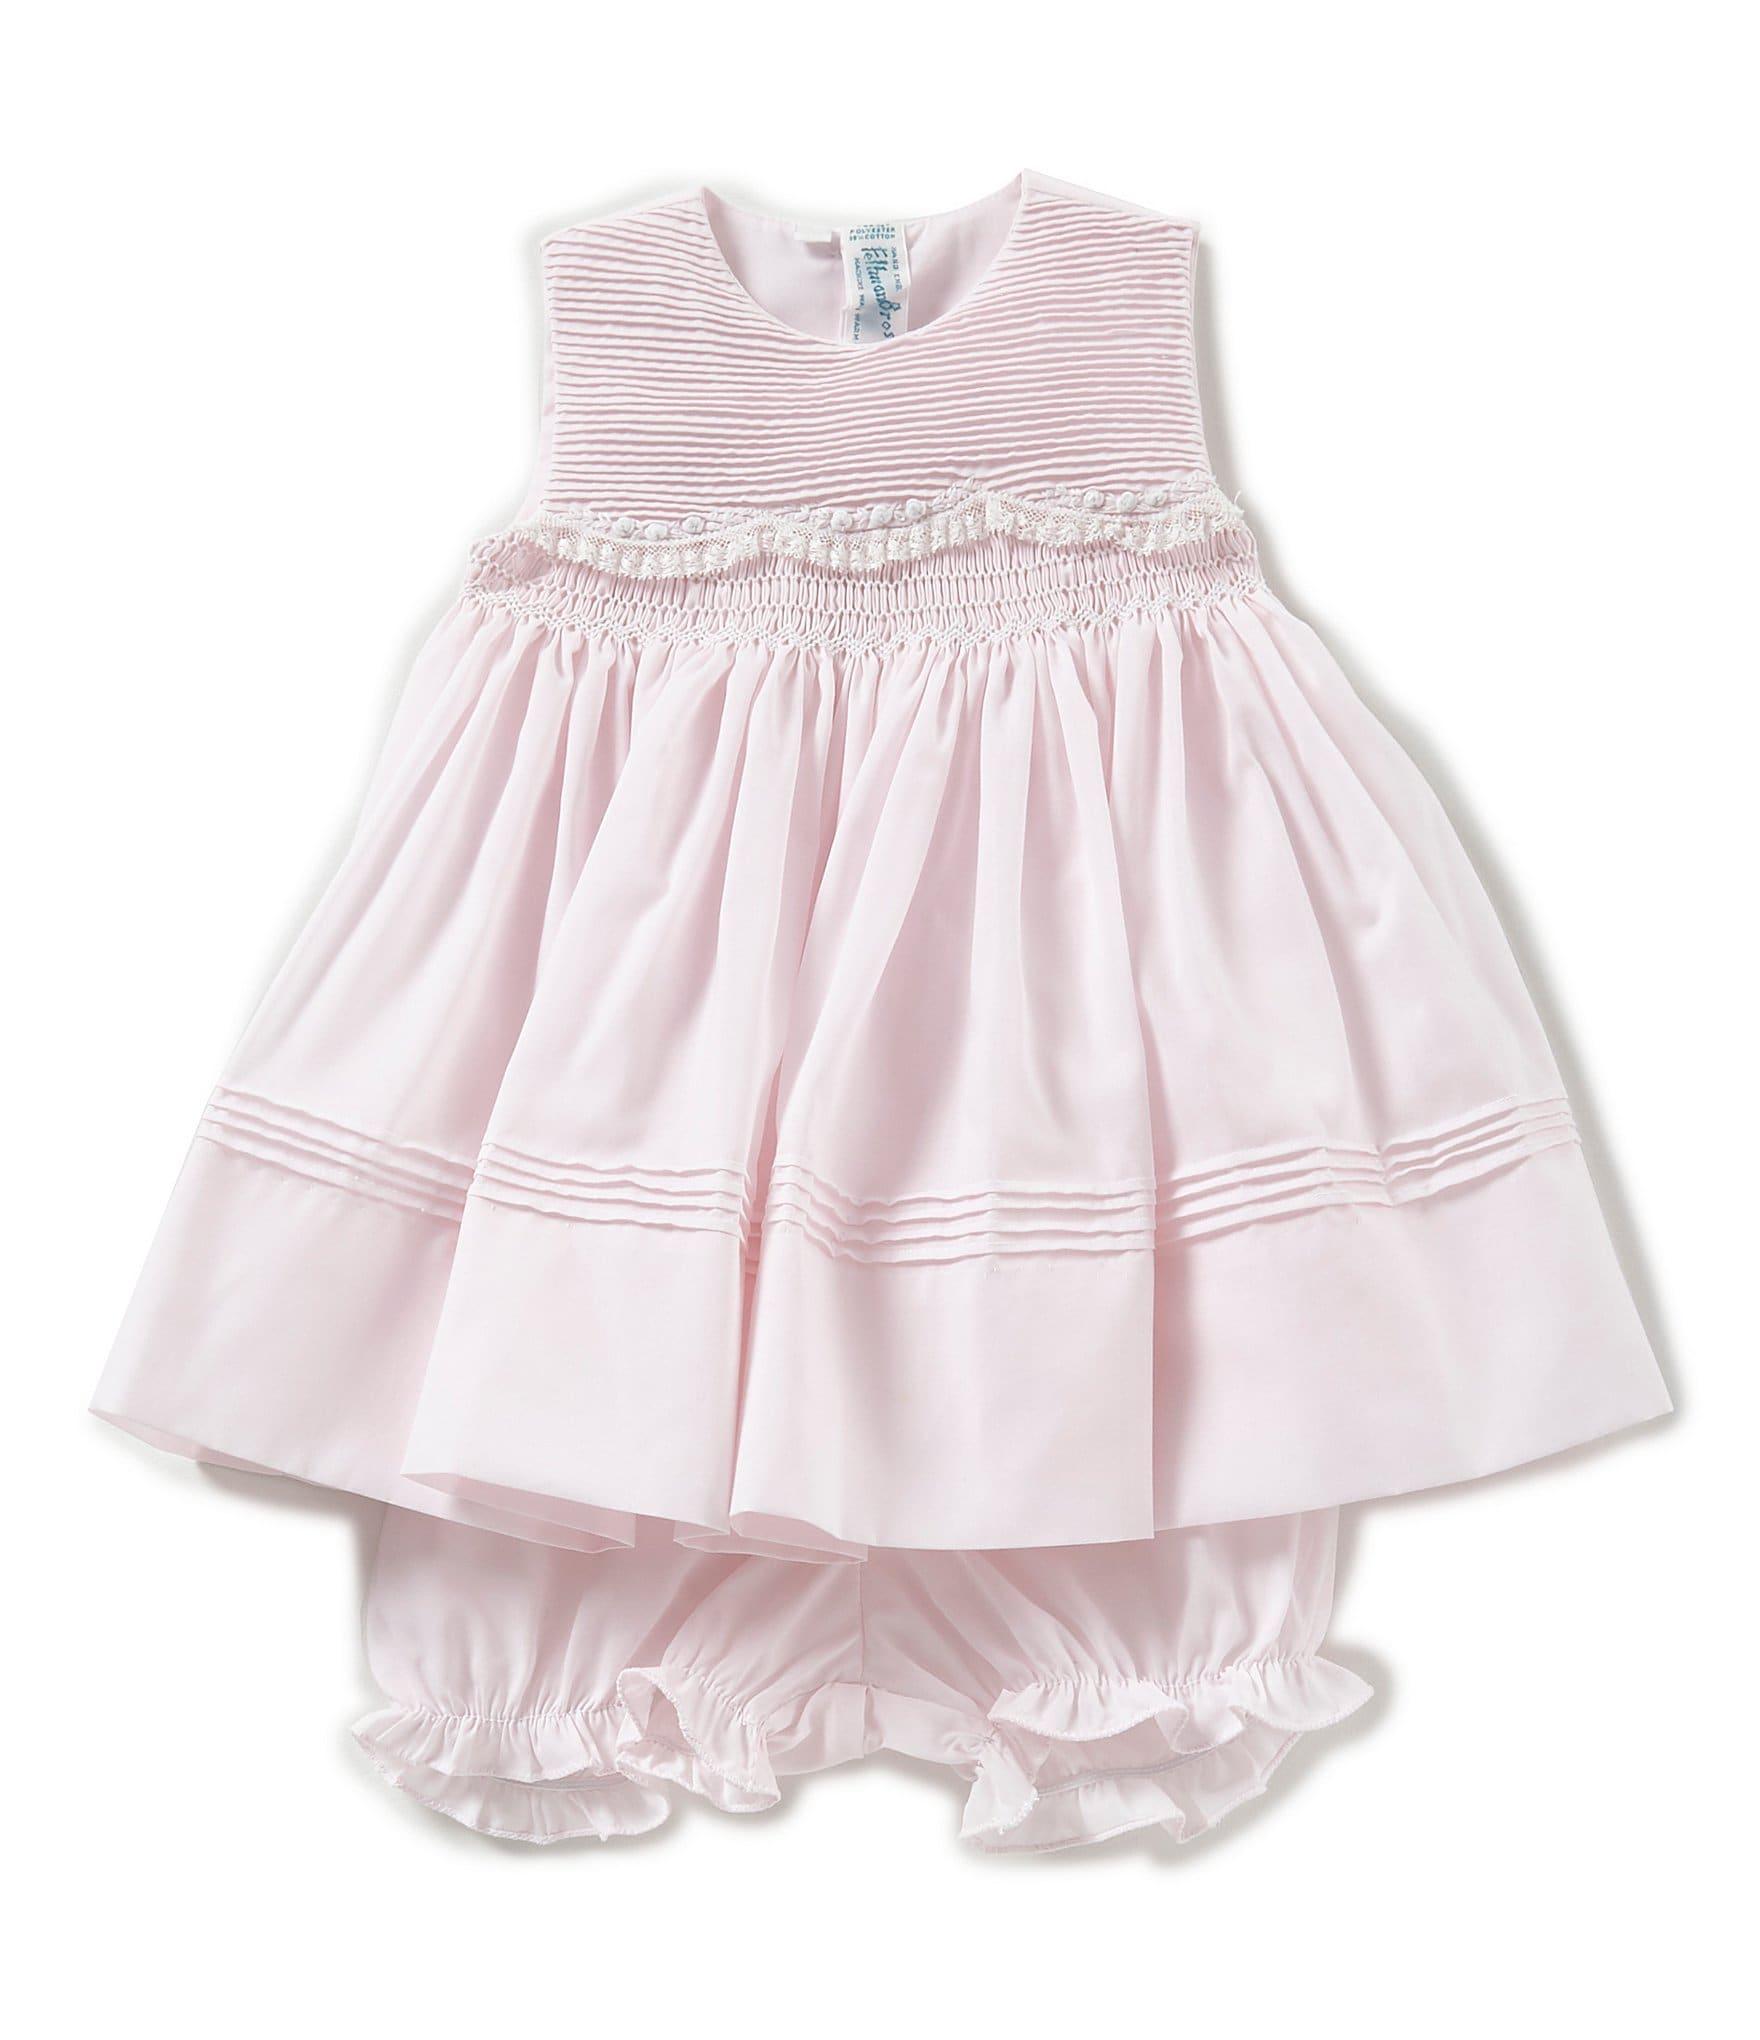 7f44b67c131f Feltman Brothers Baby Girls 3-9 Months Sleeveless Scallop Lace Dress |  Dillard's